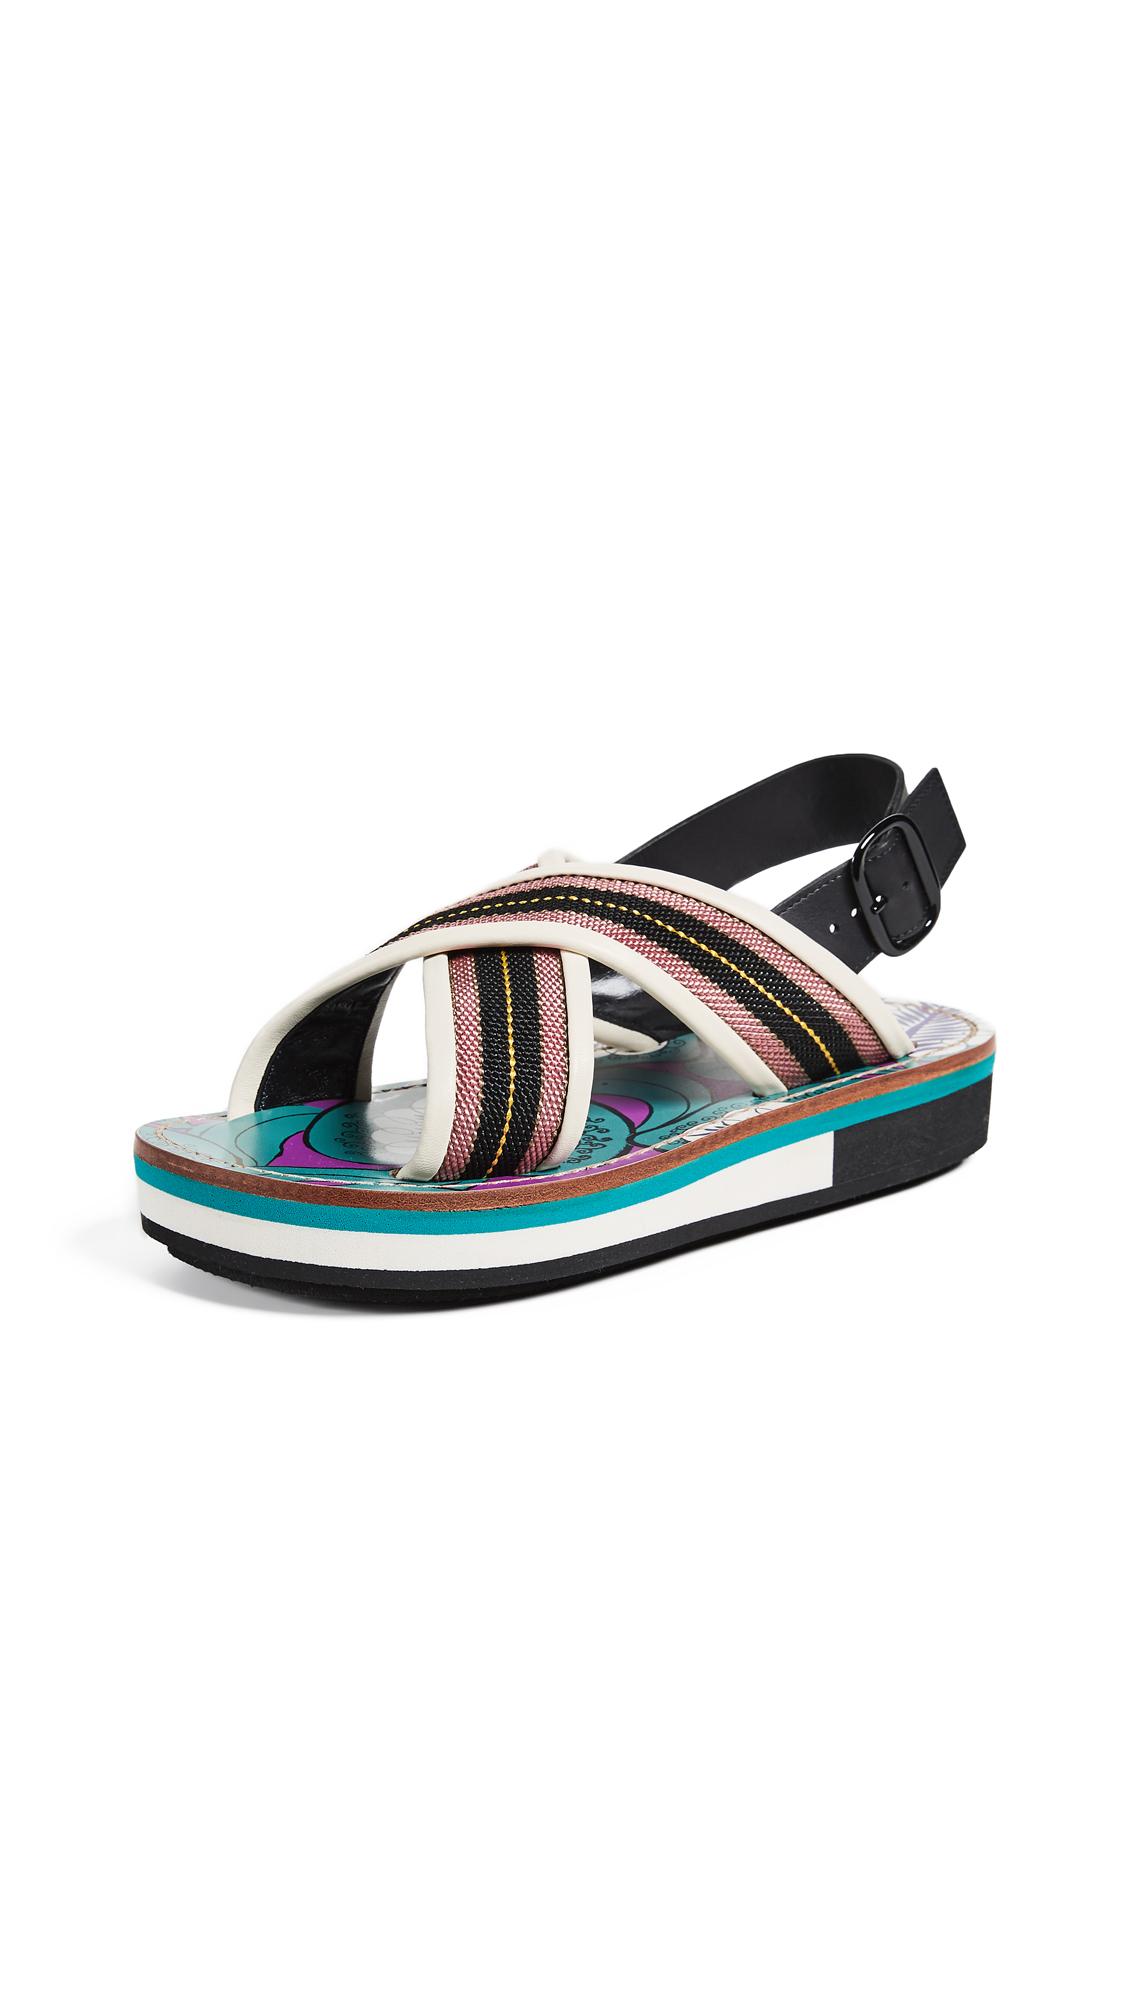 Striped Leather-Trimmed Slingback Sandals, Nero/Samoa